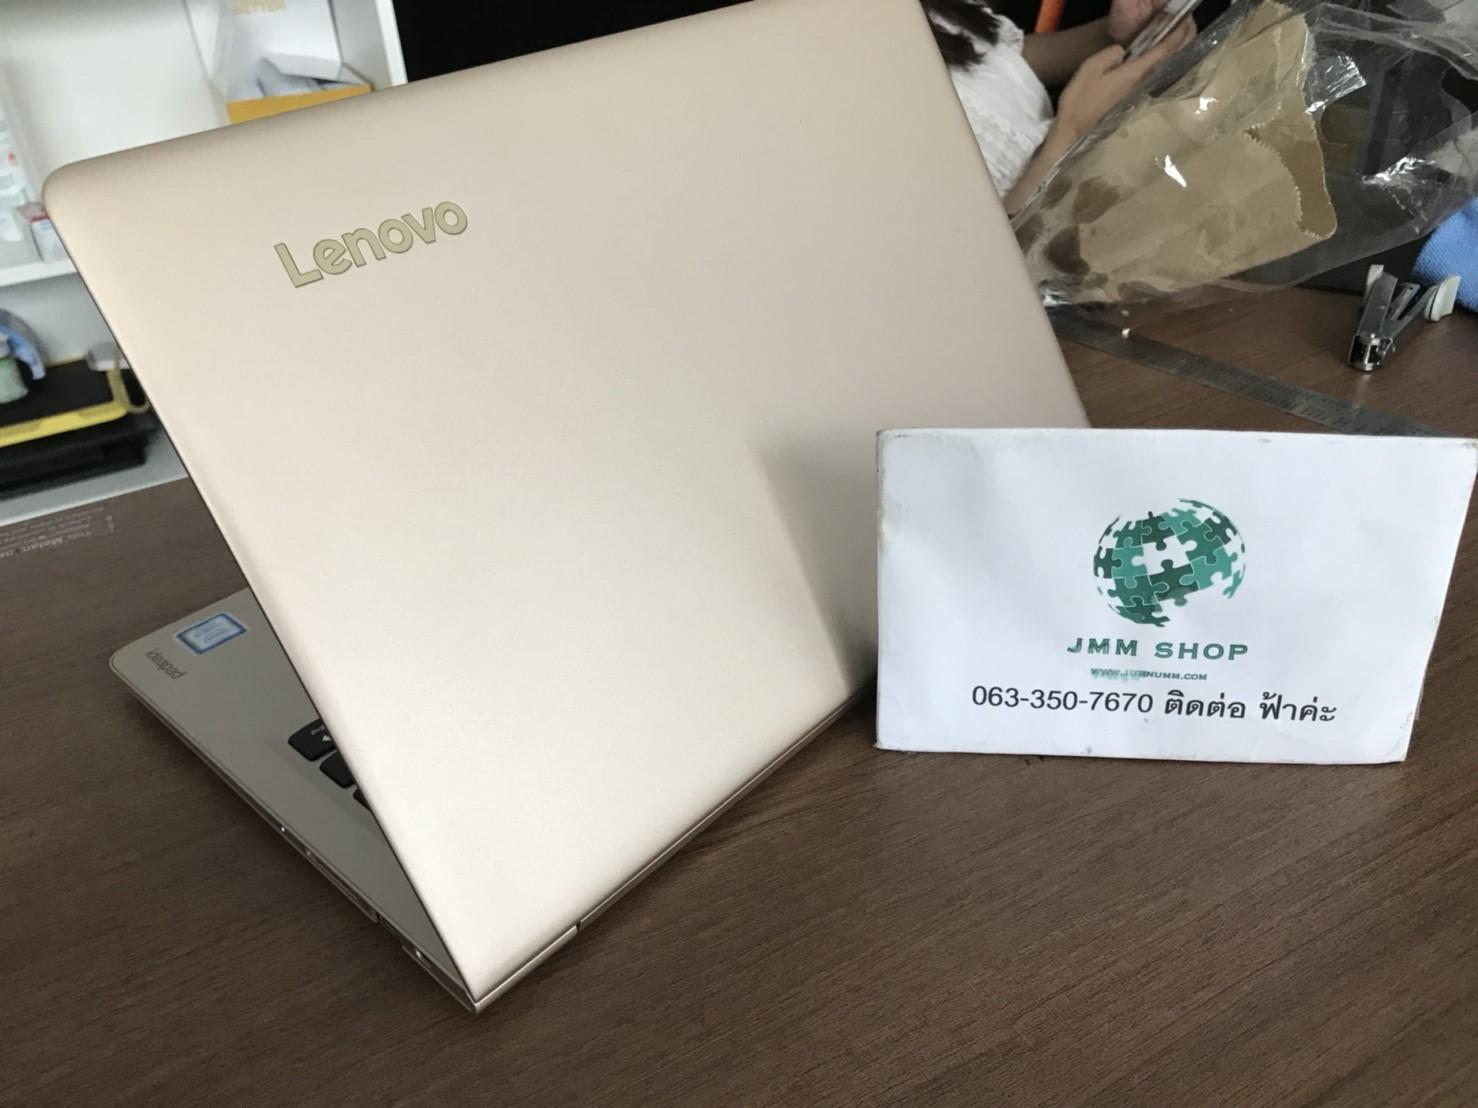 JMM - 168 ขายโน๊ตบุ๊คมือสอง Lenovo IdeaPad 710S 80VQ003CTA